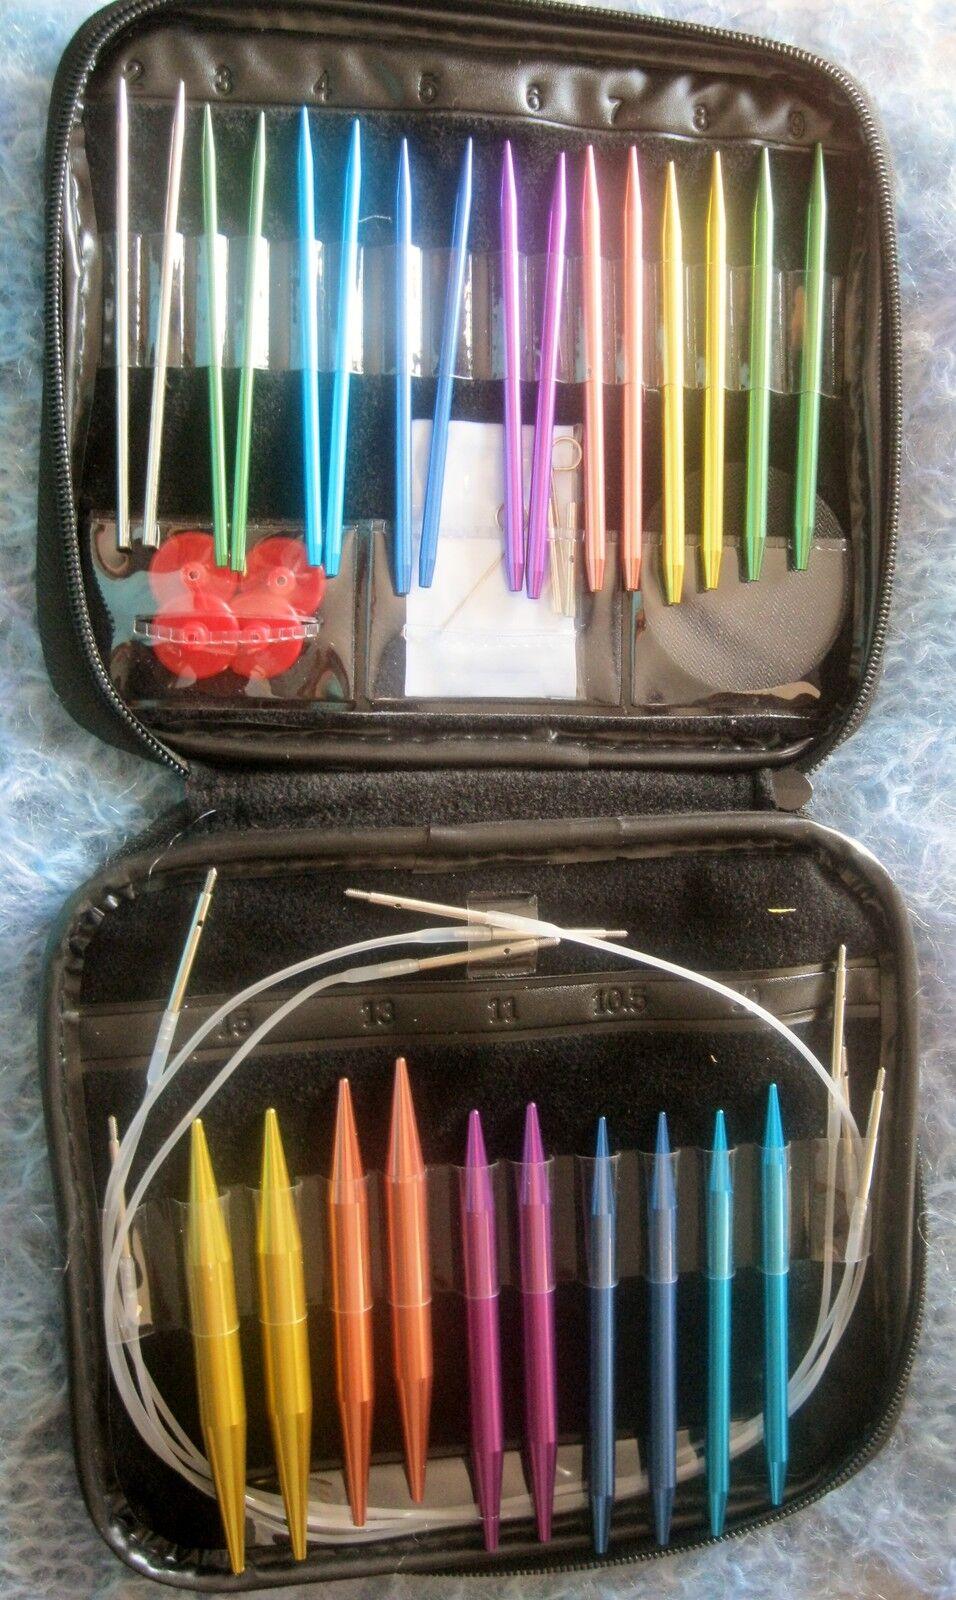 Boye Needlemaster Interchangeable Aluminum Knitting Set - 40 Pieces Knitmates